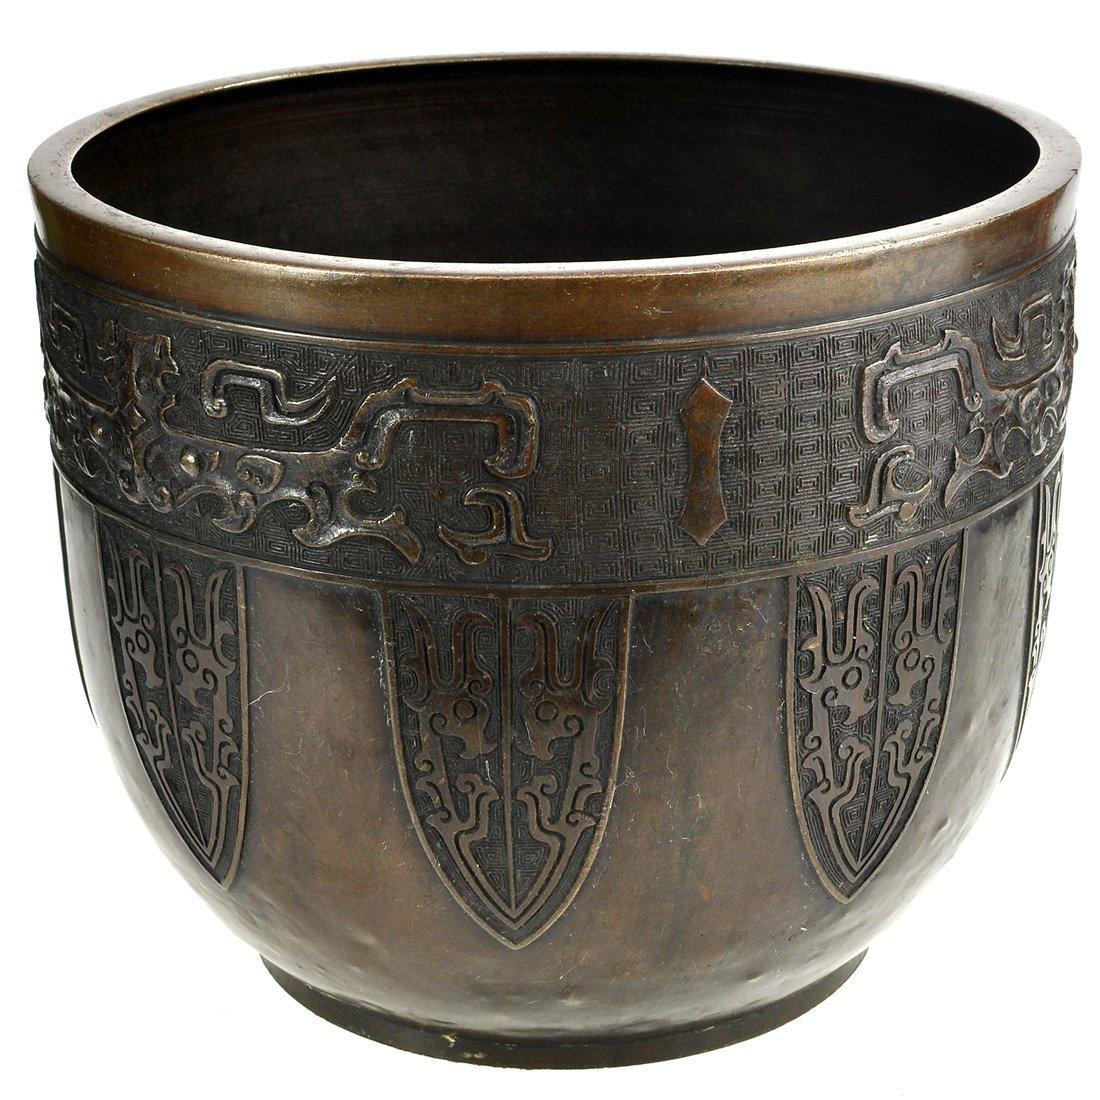 4: YTTERFODER, brons, 17/1800-tal, Asien